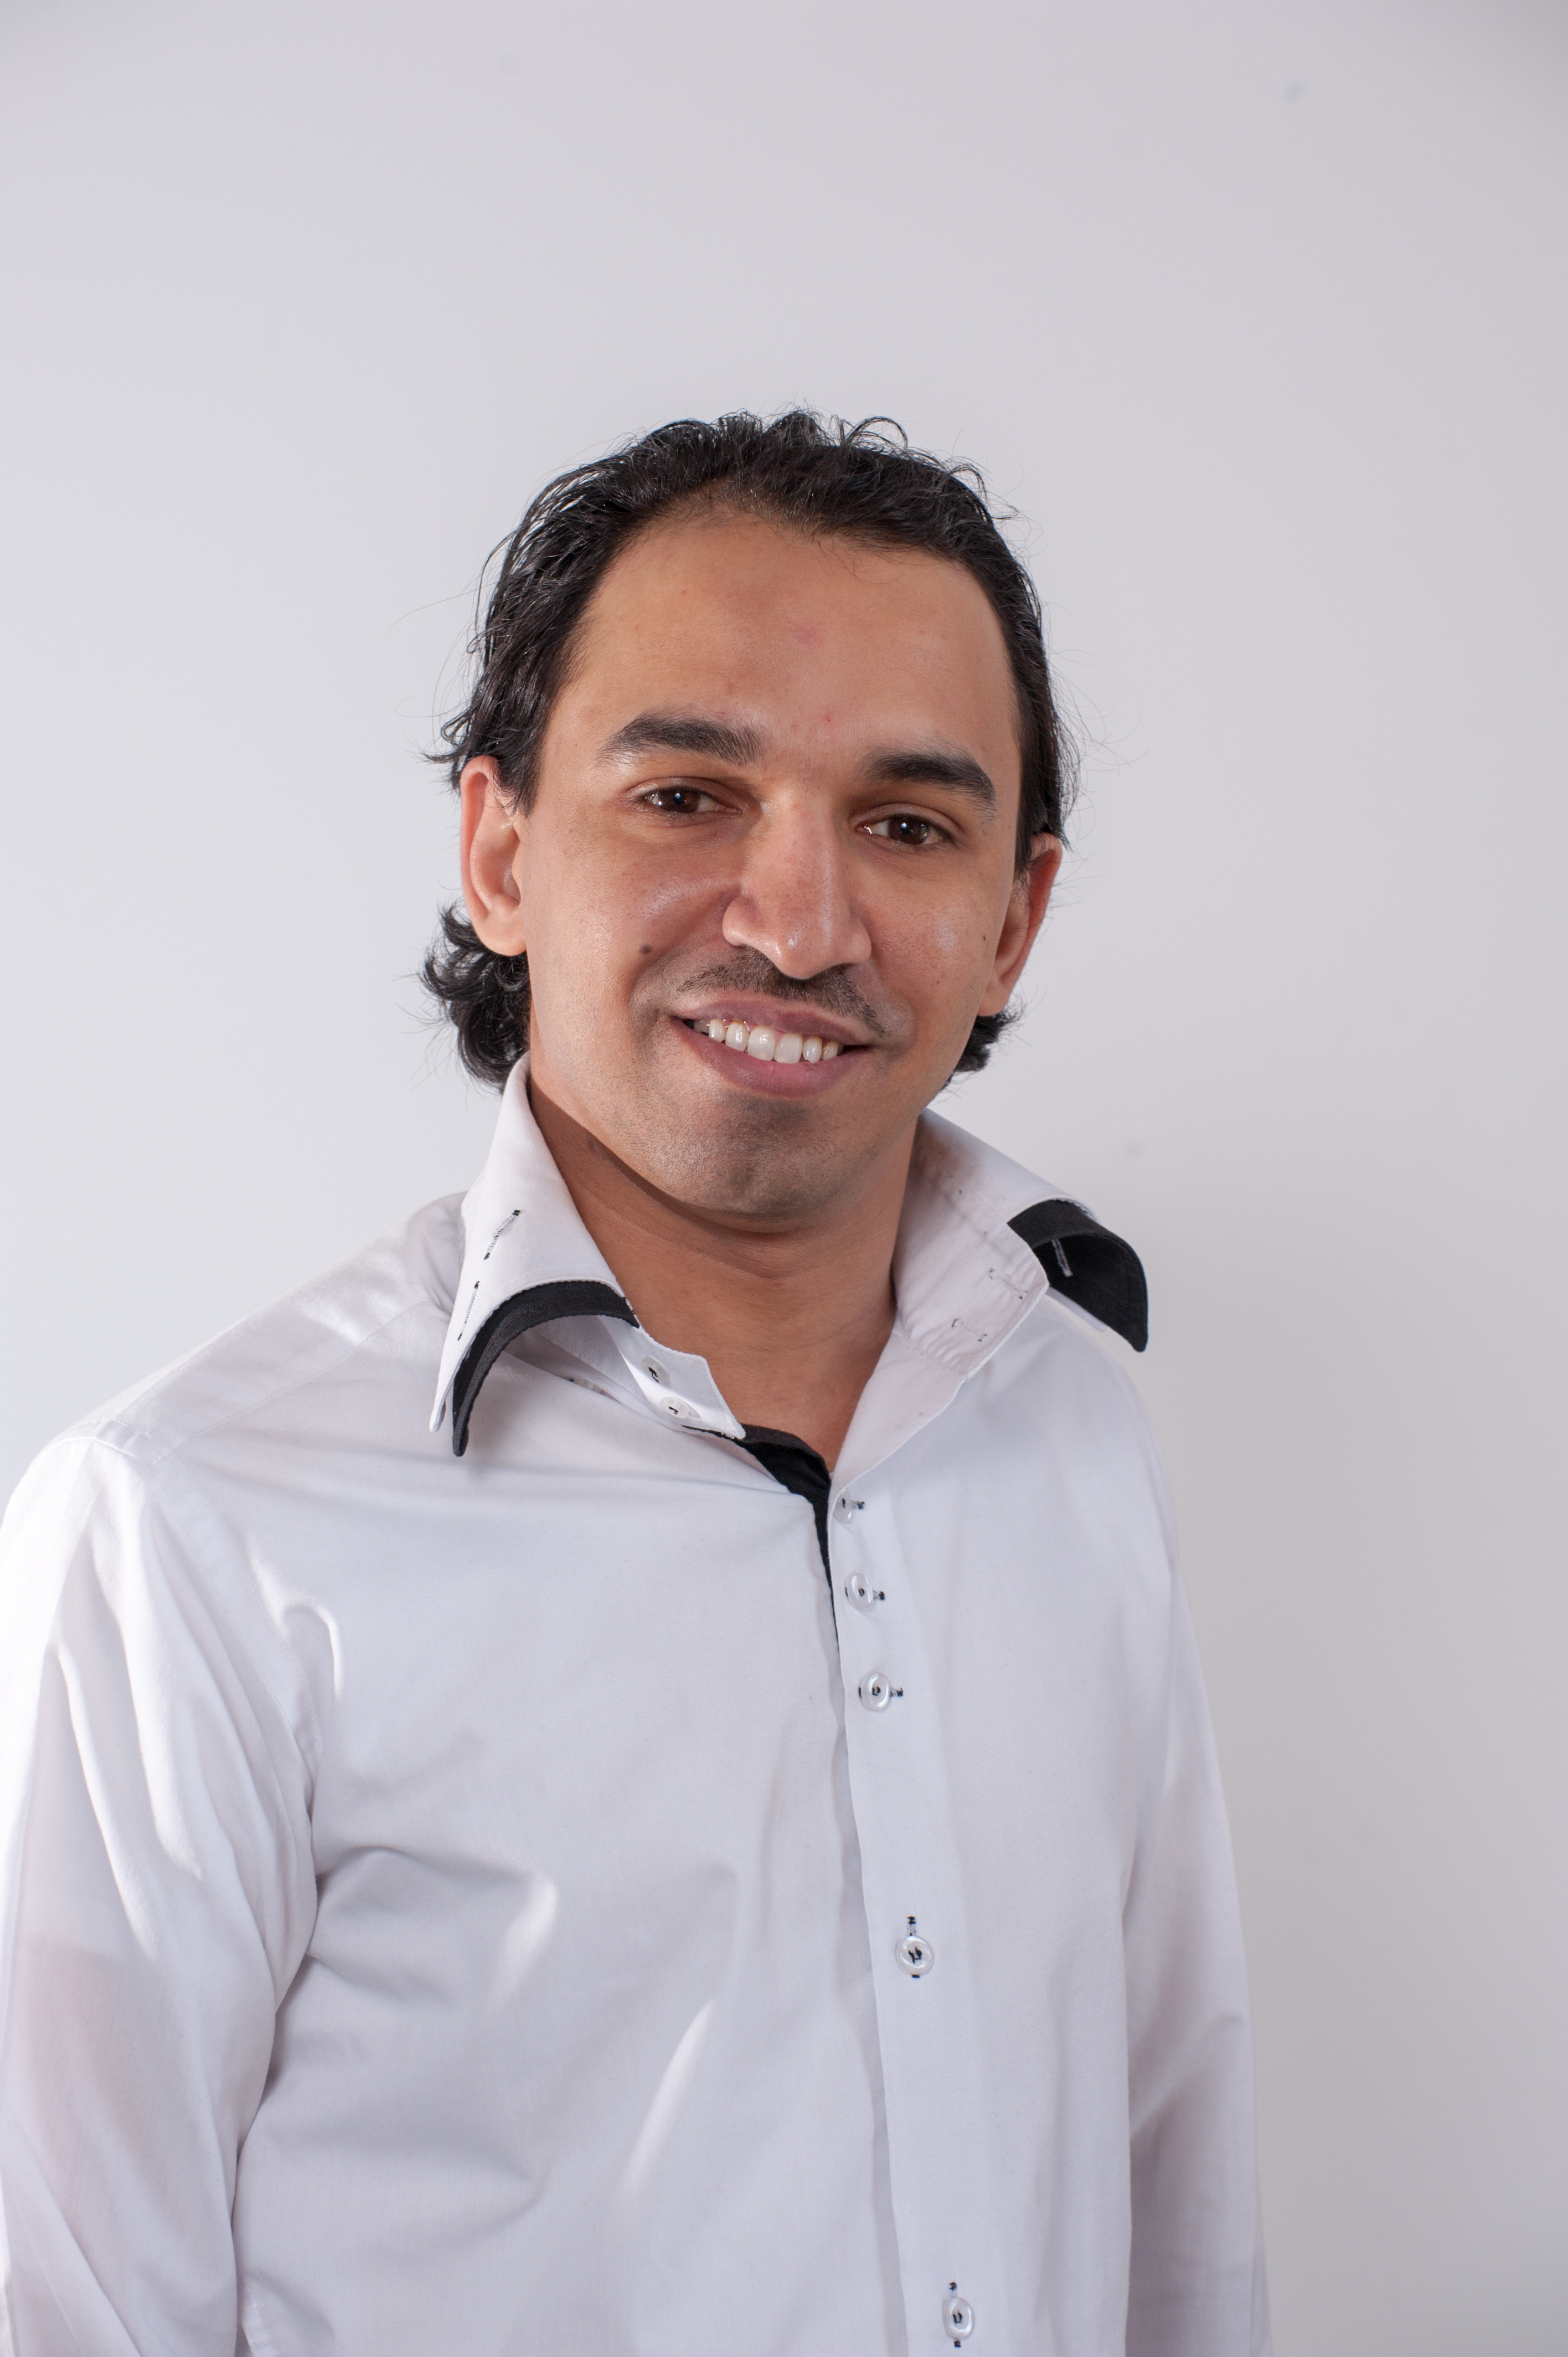 Naif Alzahrani